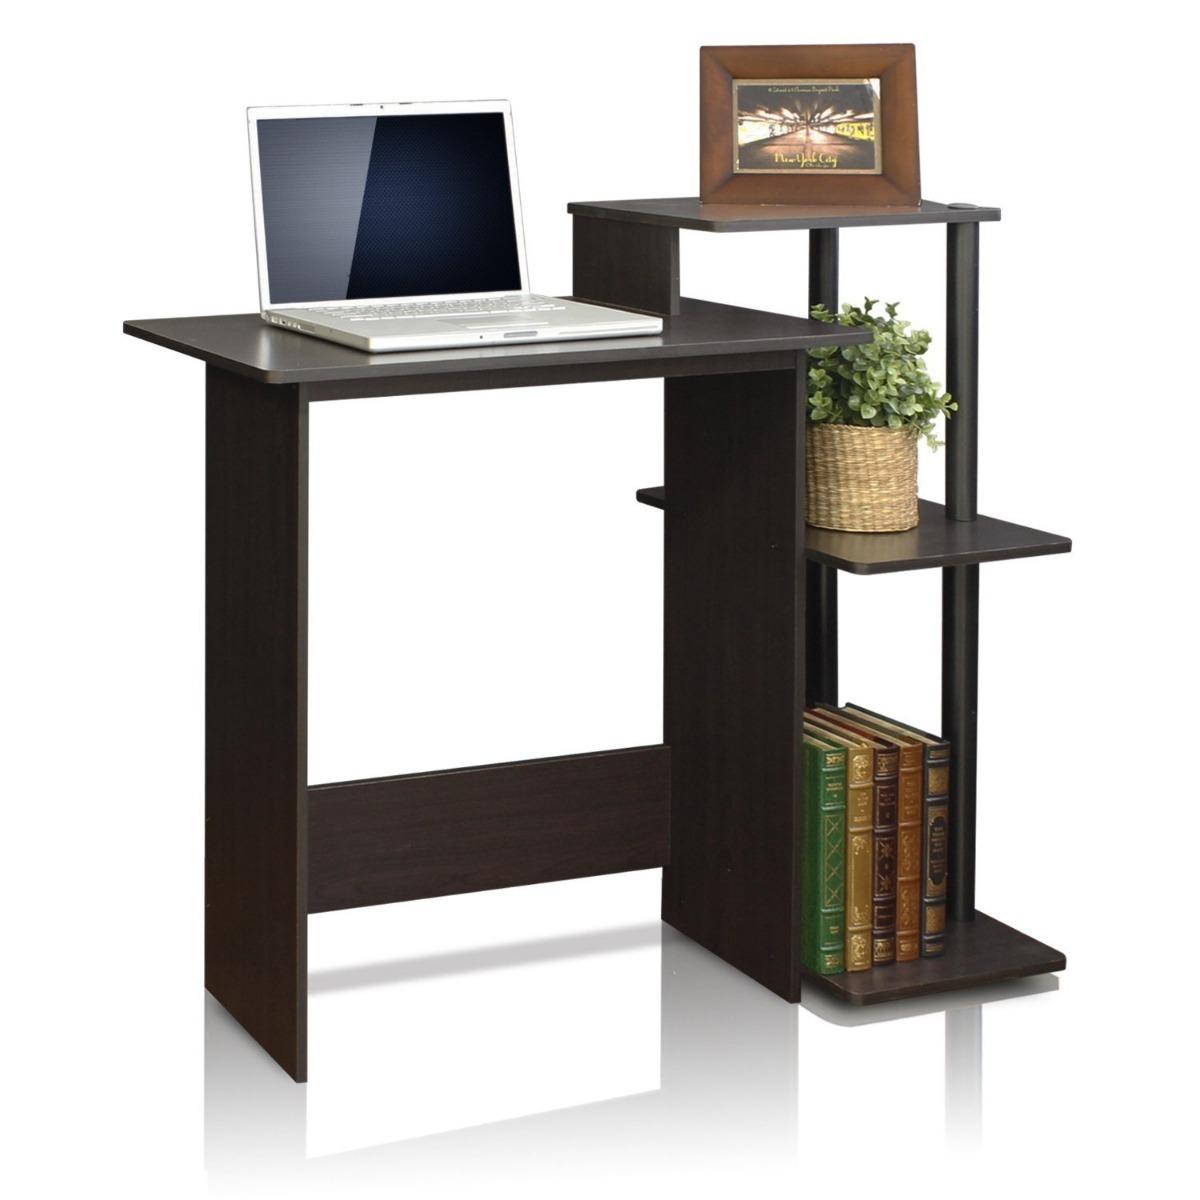 Escritorio para computadora mueble para oficina o for Computadoras para oficina